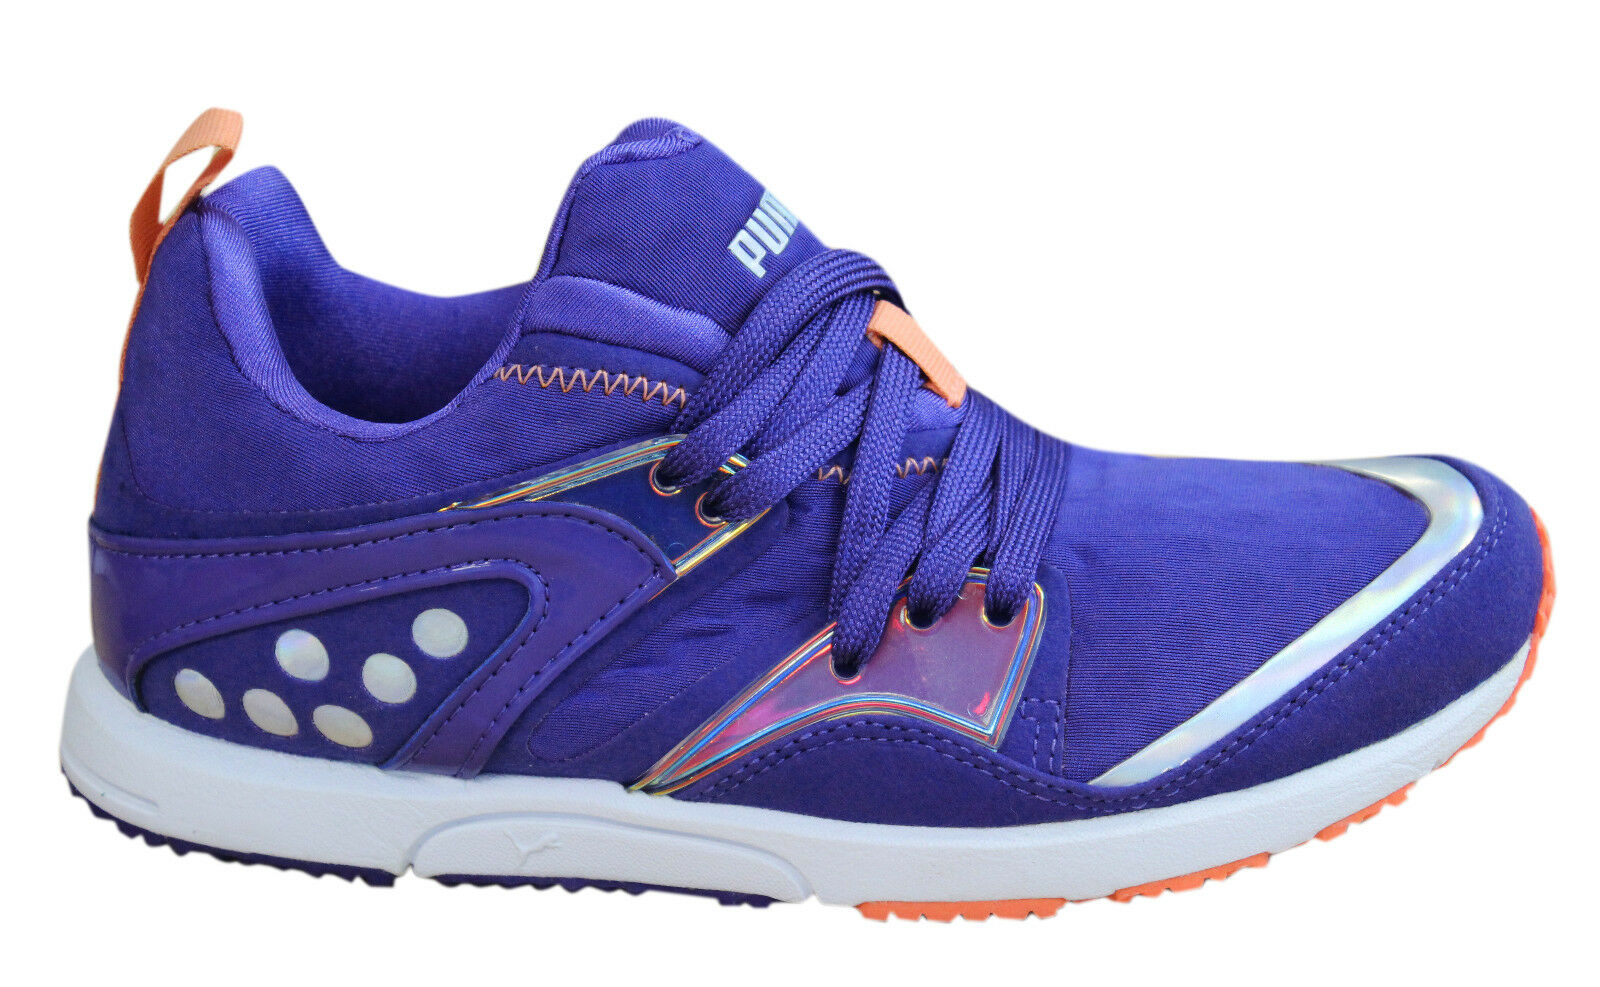 Puma Future Blaze Lite Irides Irides Irides Damenschuhe Trainers Slip On Schuhes Purple 355429 03 D23 4aa661